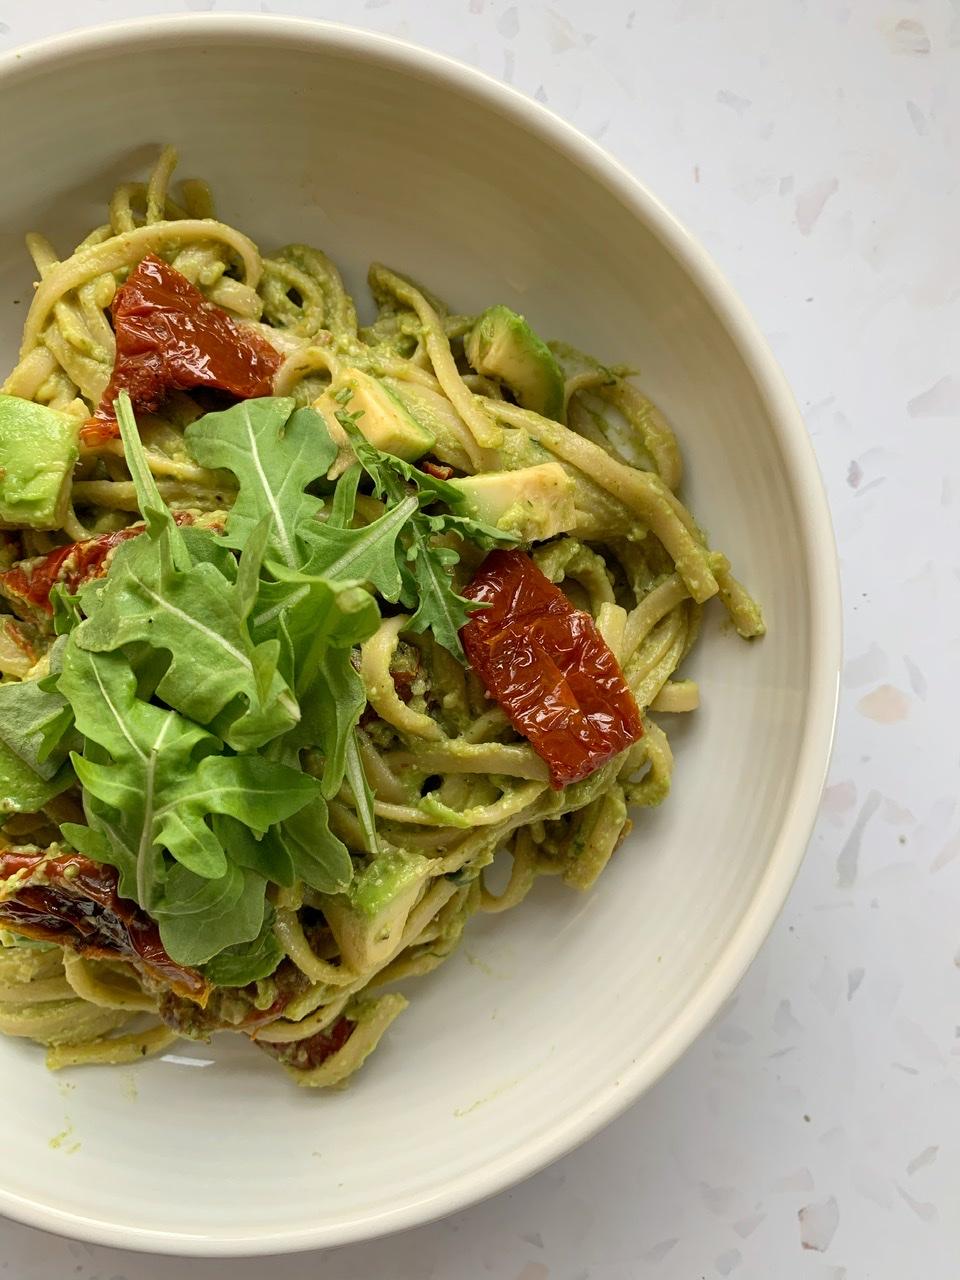 Creamy Avocado Pesto & Sundried Tomato Spaghetti